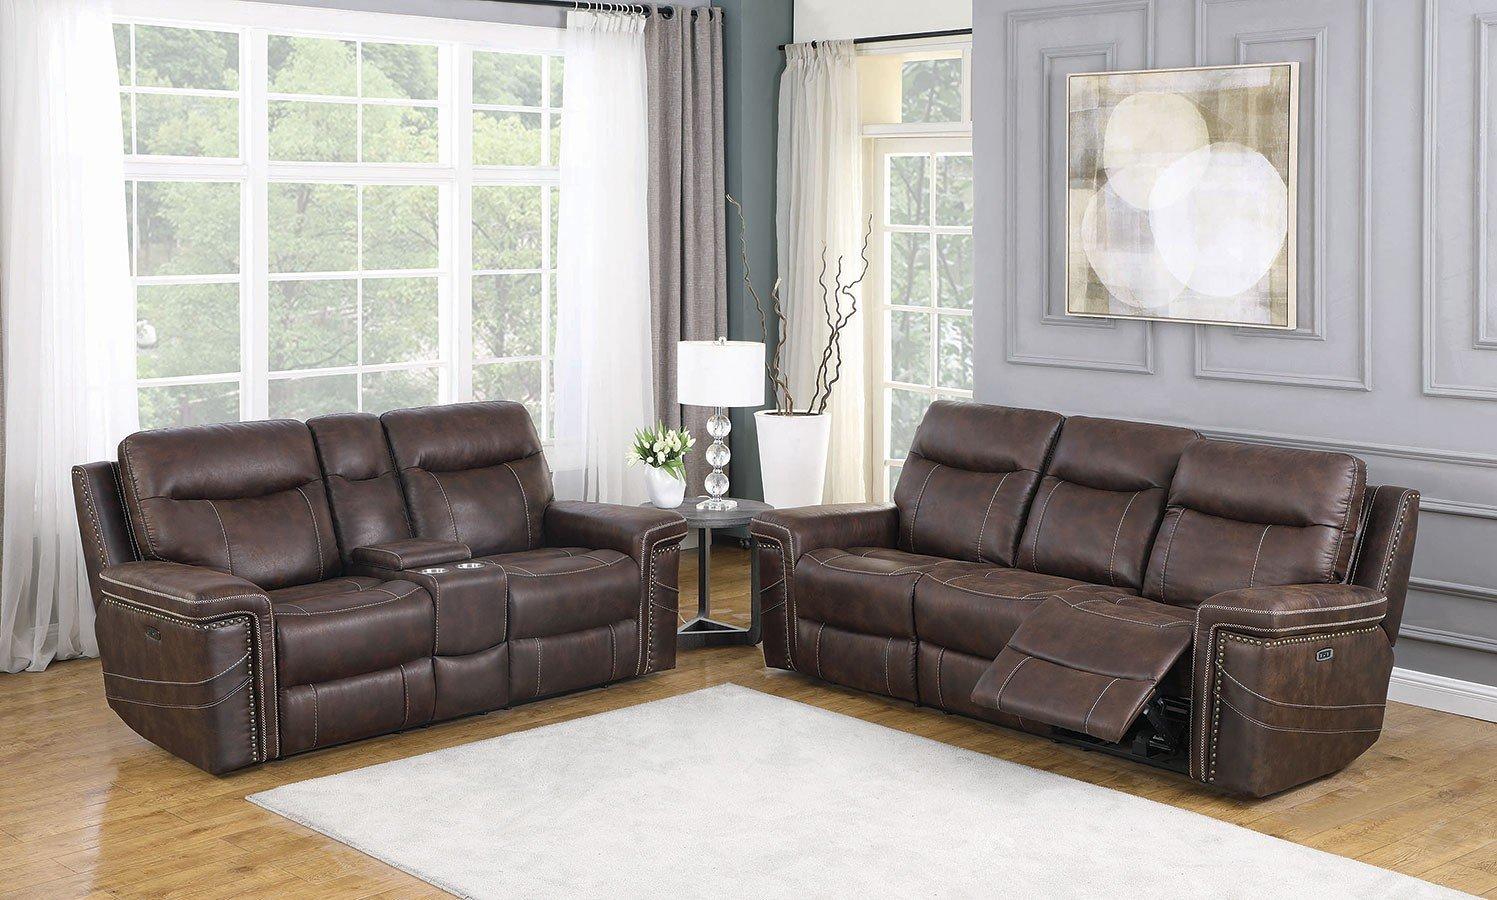 Wixom power reclining sofa